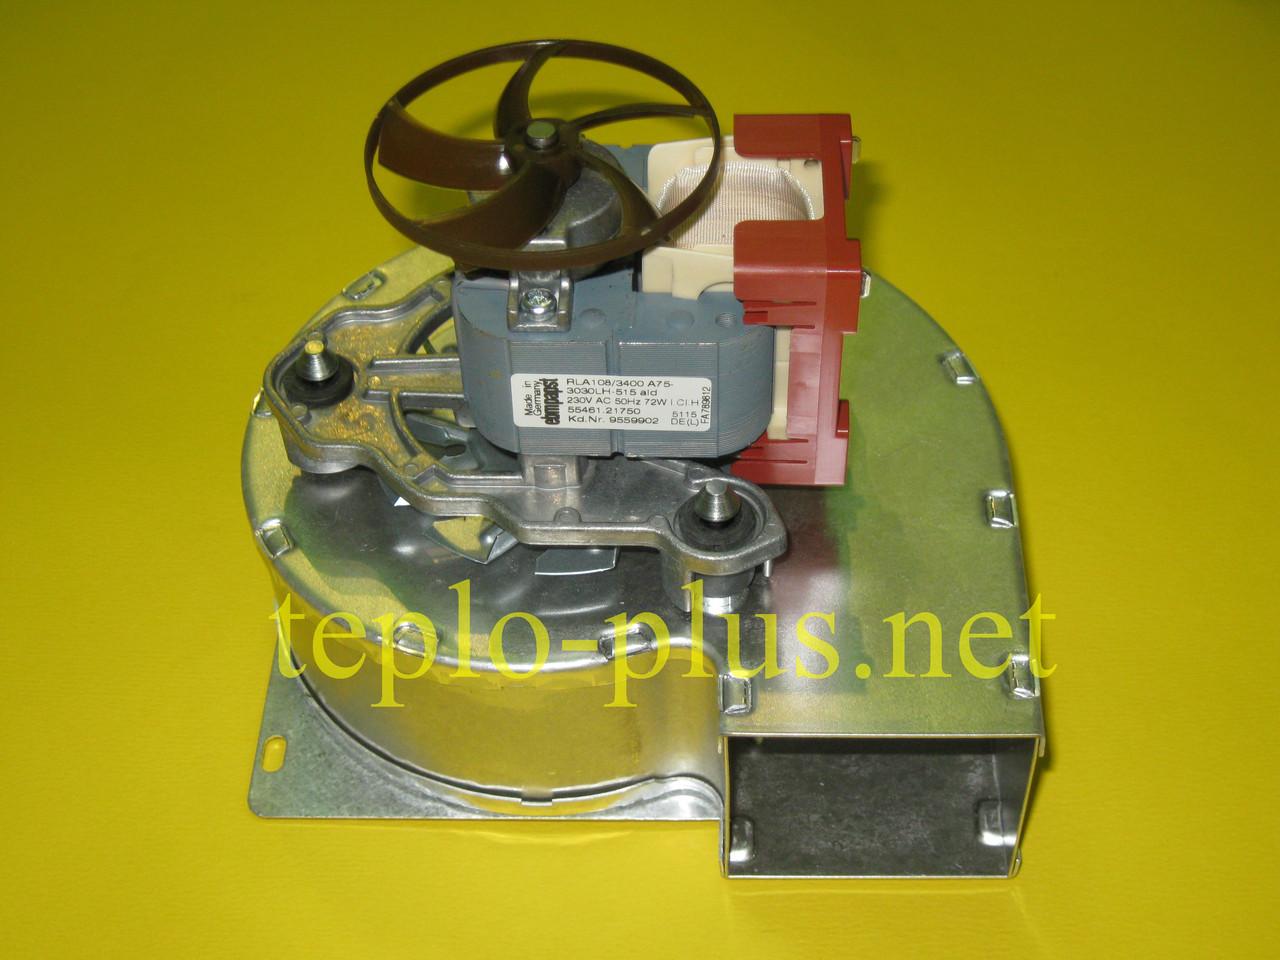 Вентилятор WНЕ 24 кВт 7819829 Viessmann Vitopend, фото 2